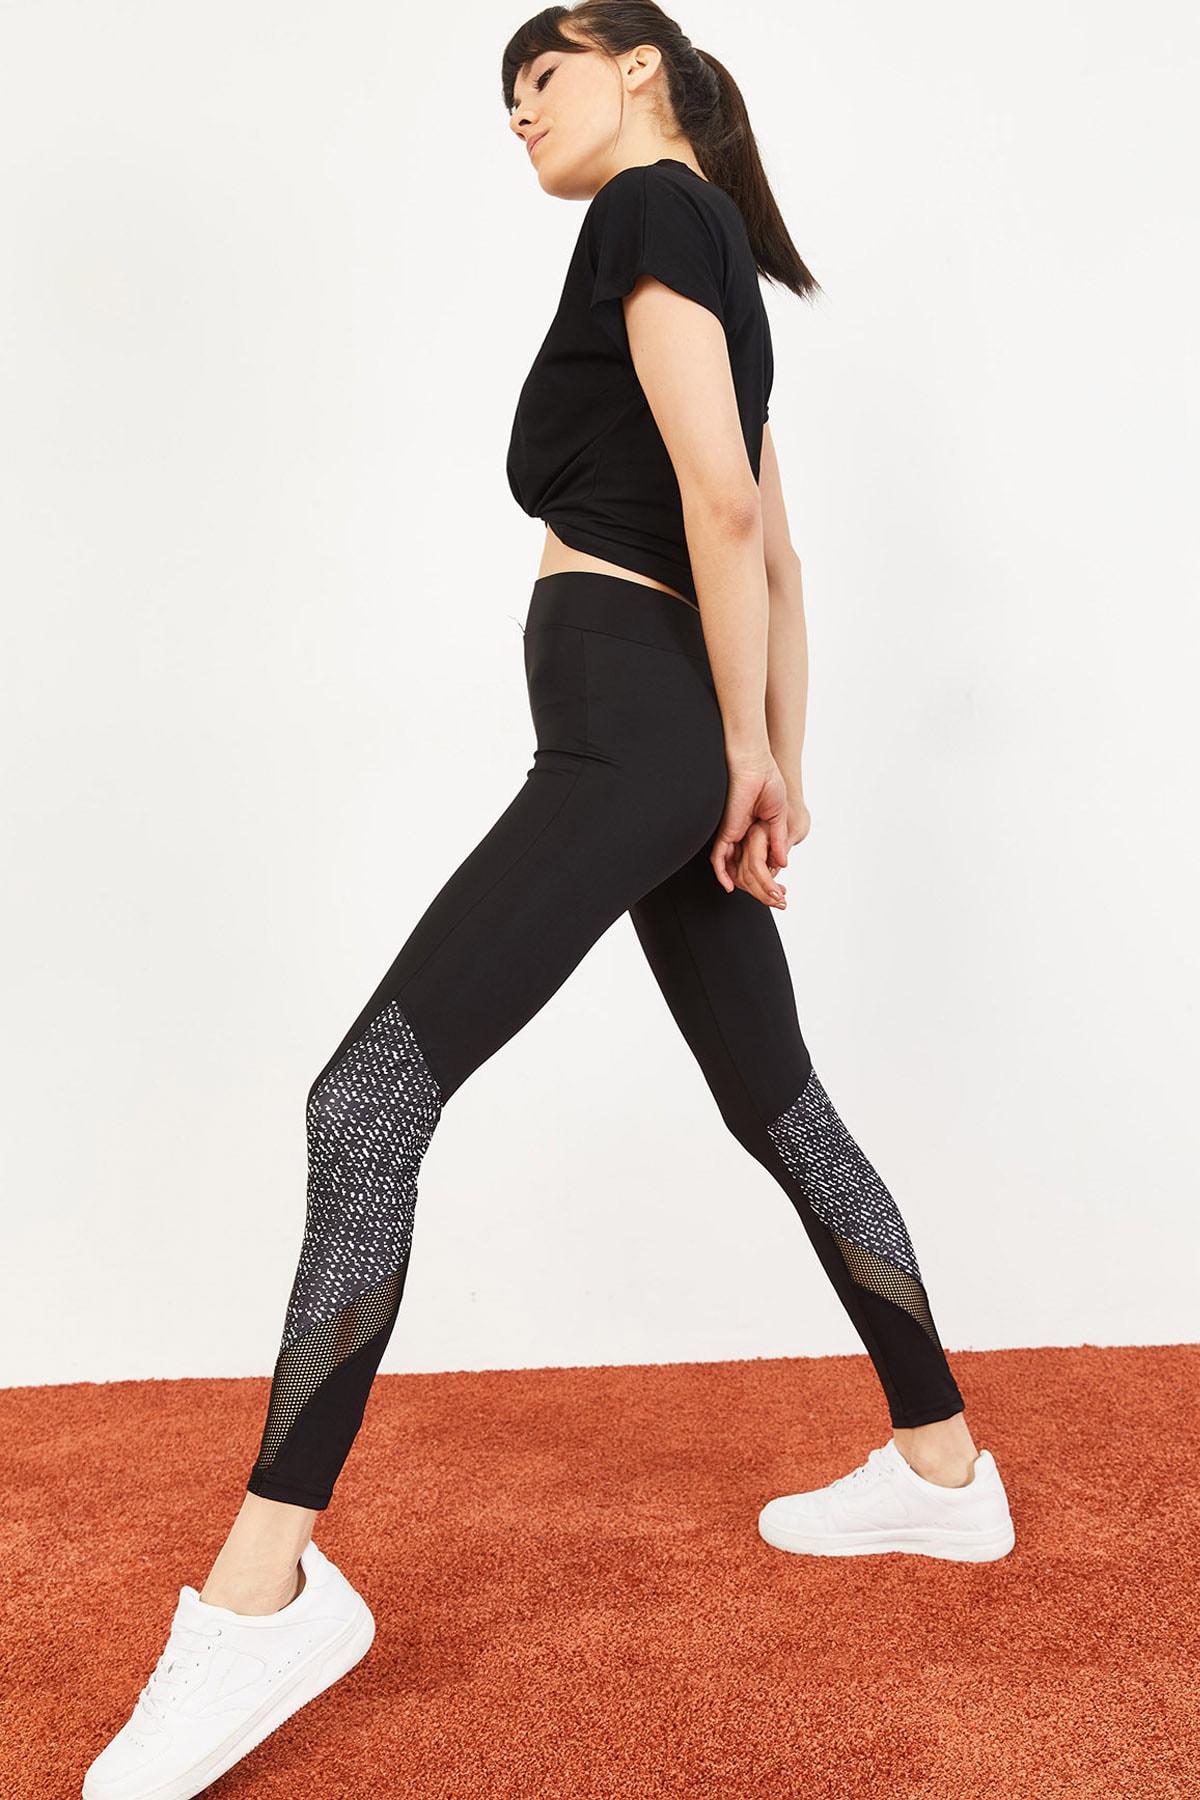 Bianco Lucci Kadın Diz Altı Digital Baskı Çapraz Tül Spor Tayt Siyah 10051056 1